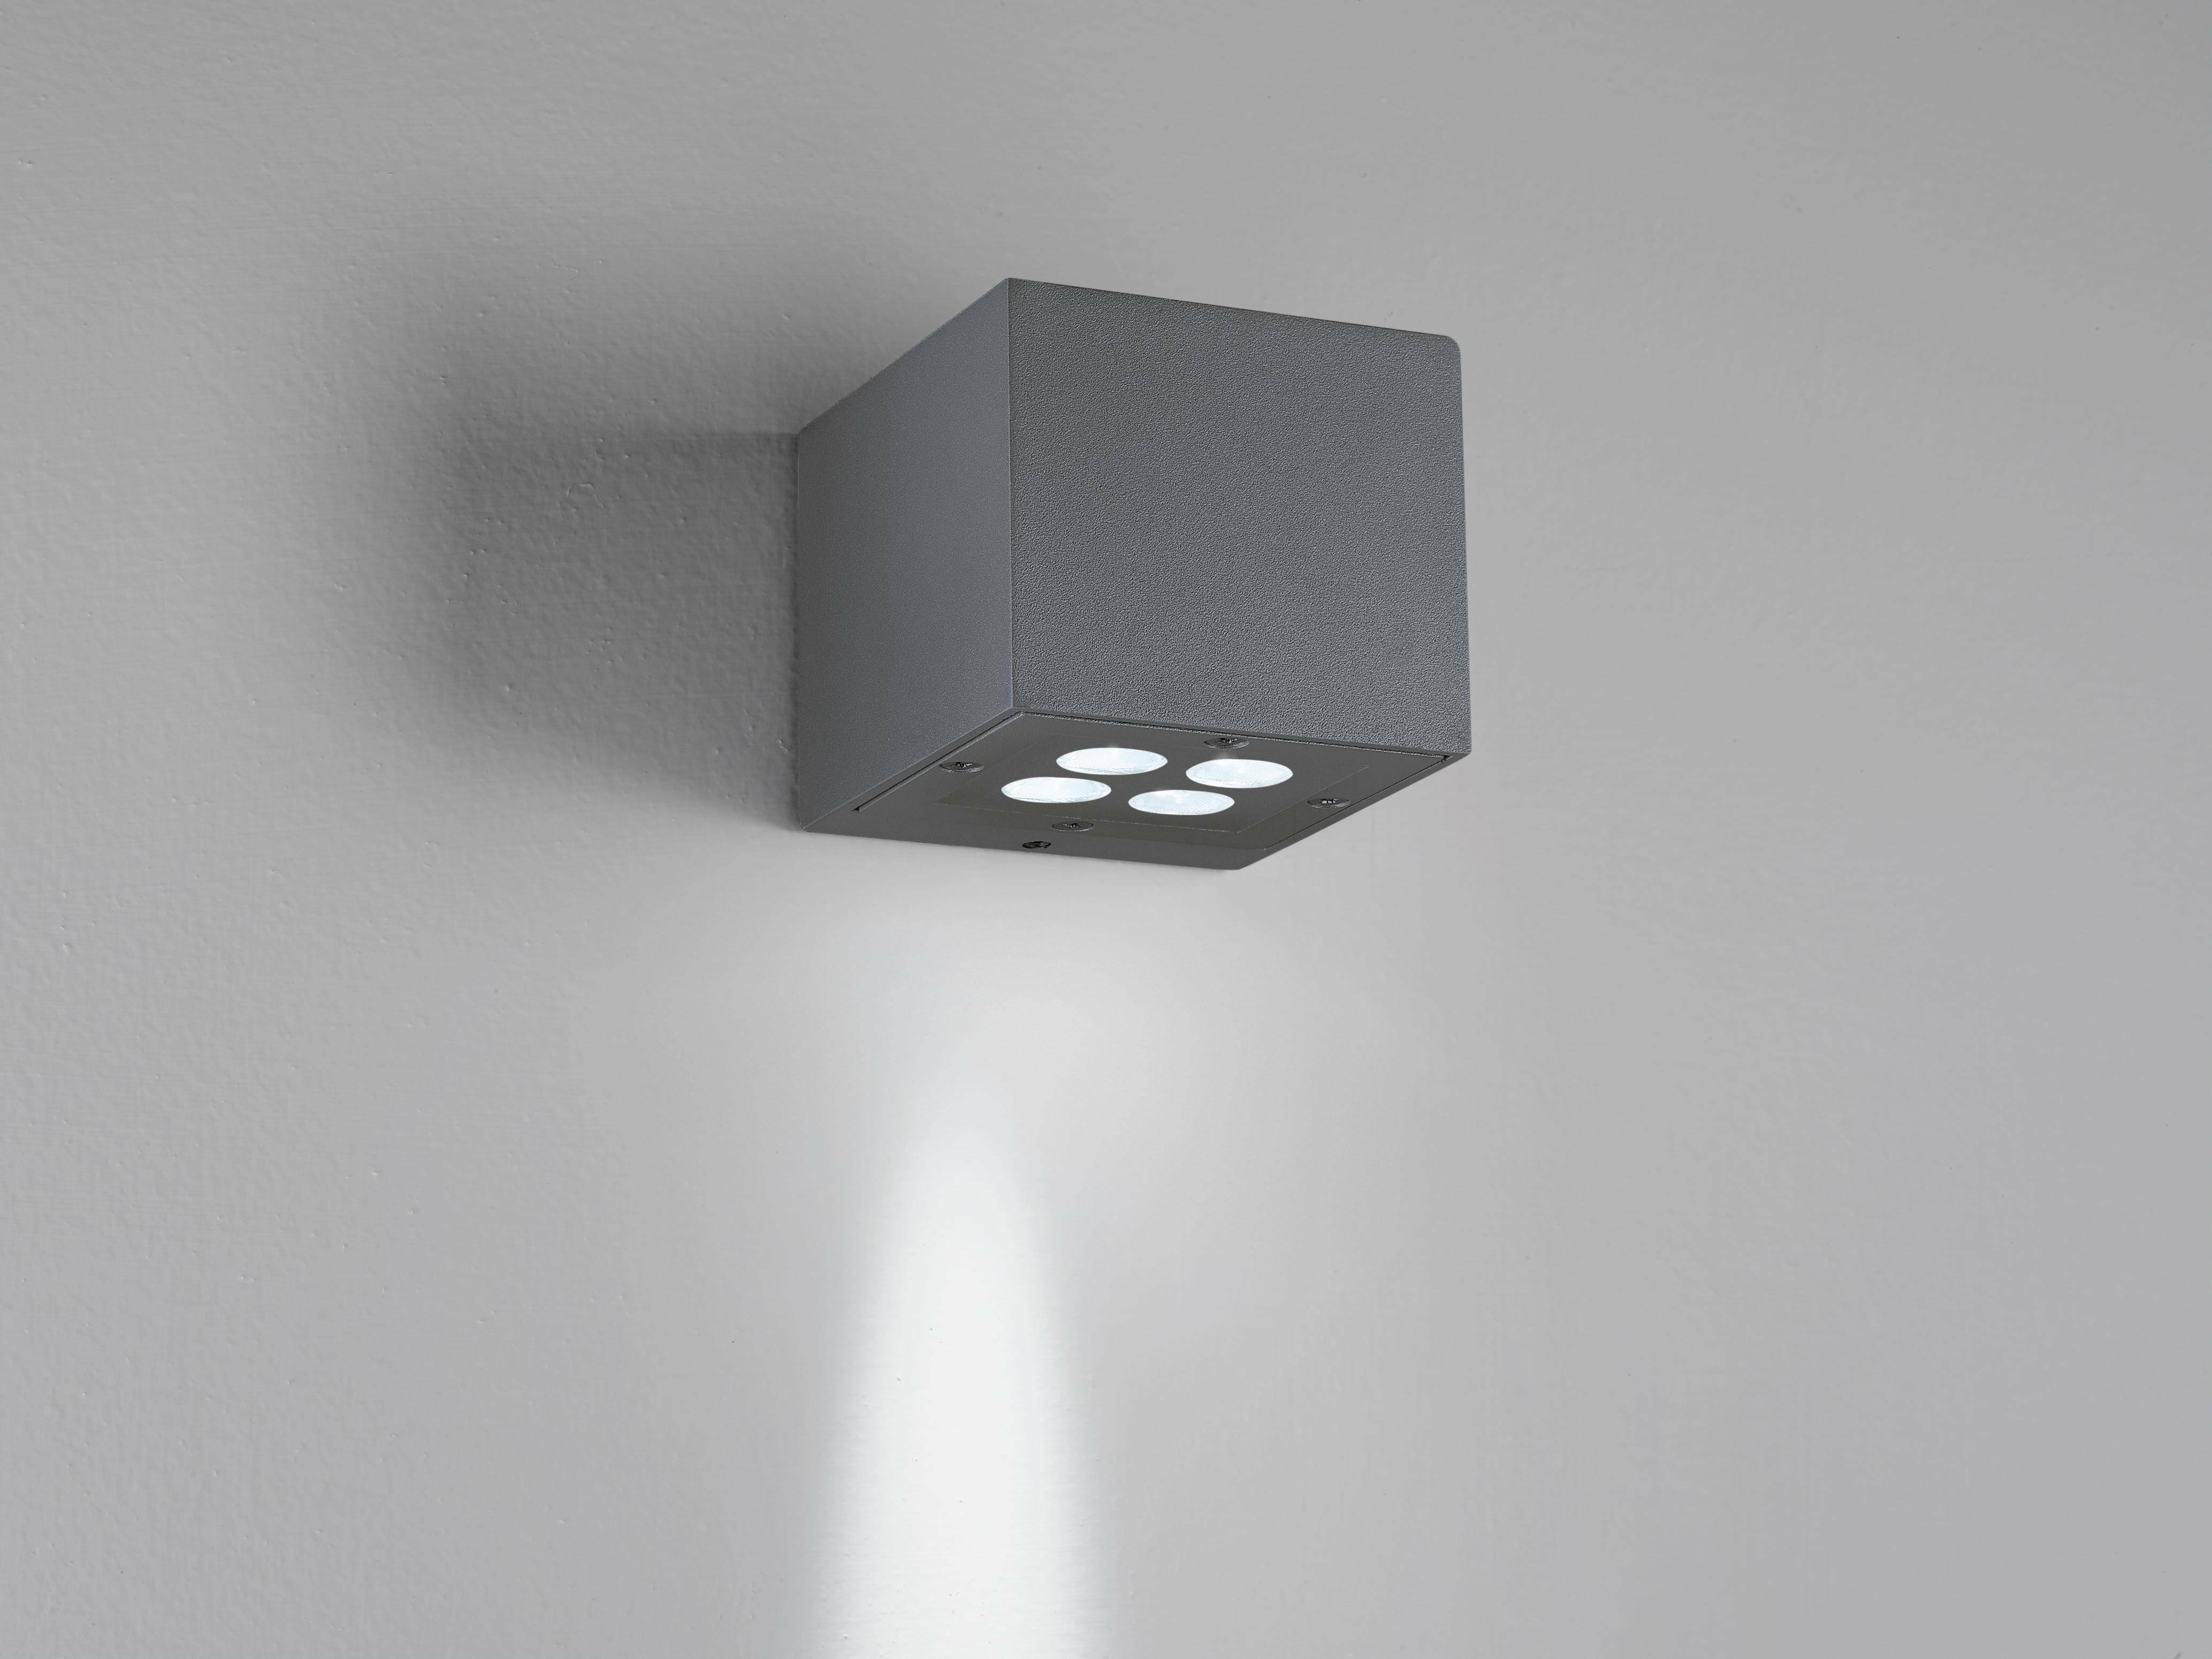 Nobile illuminazione led da esterno faretto led lampada led faro